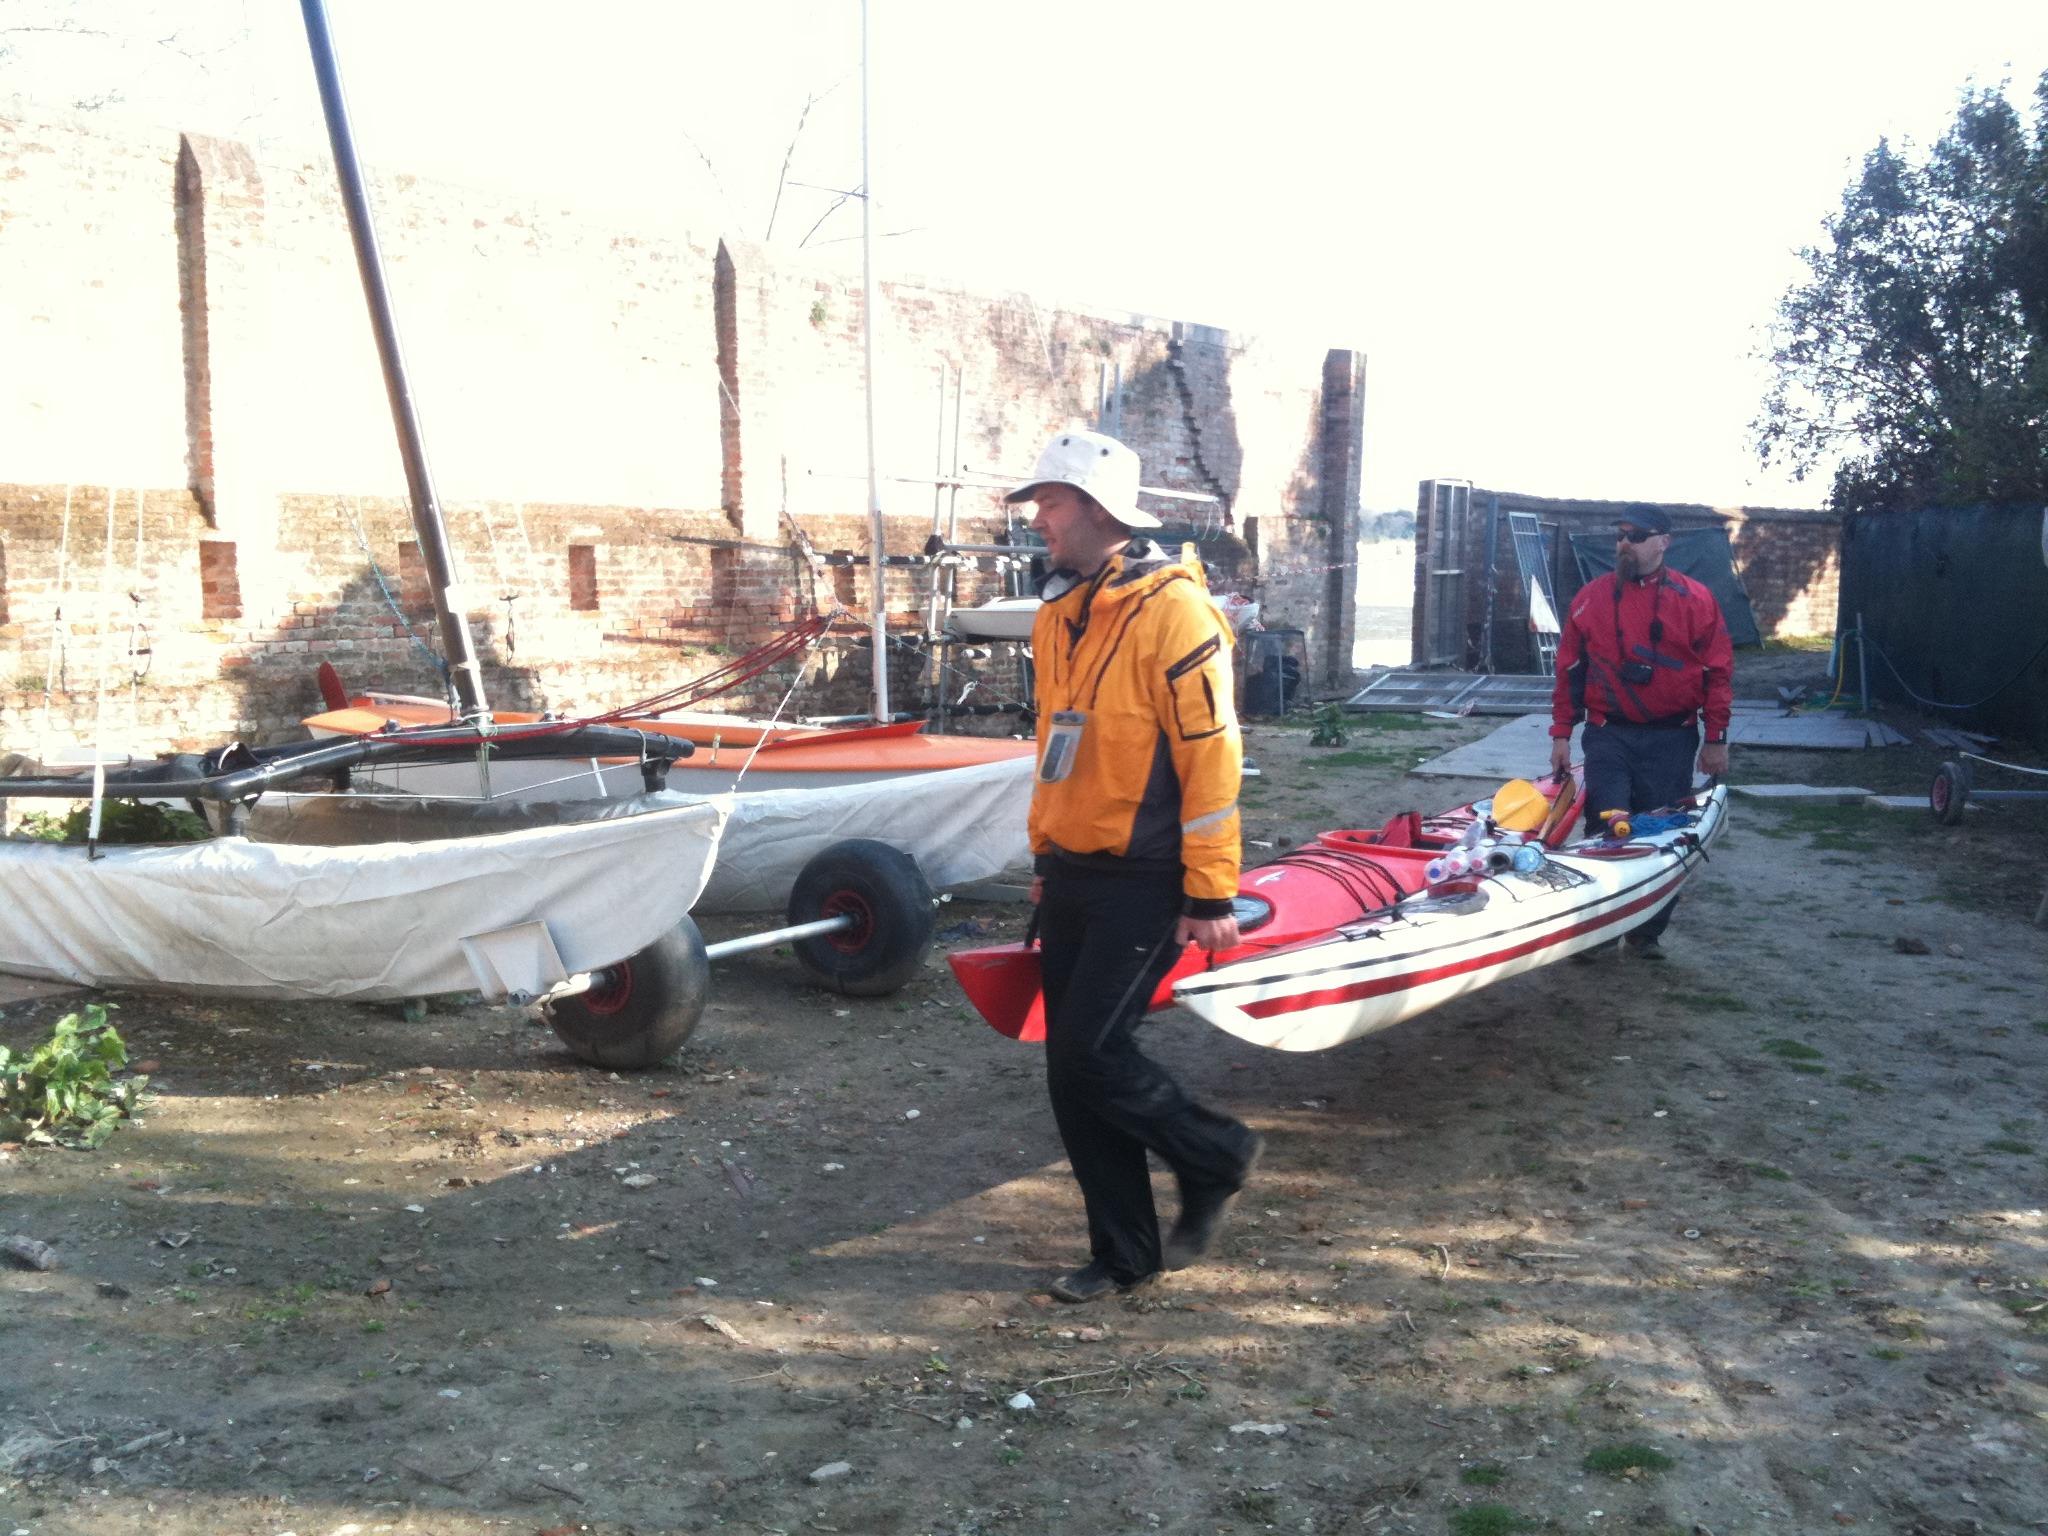 Kayaking Venice - Mobile Photos - Day 4